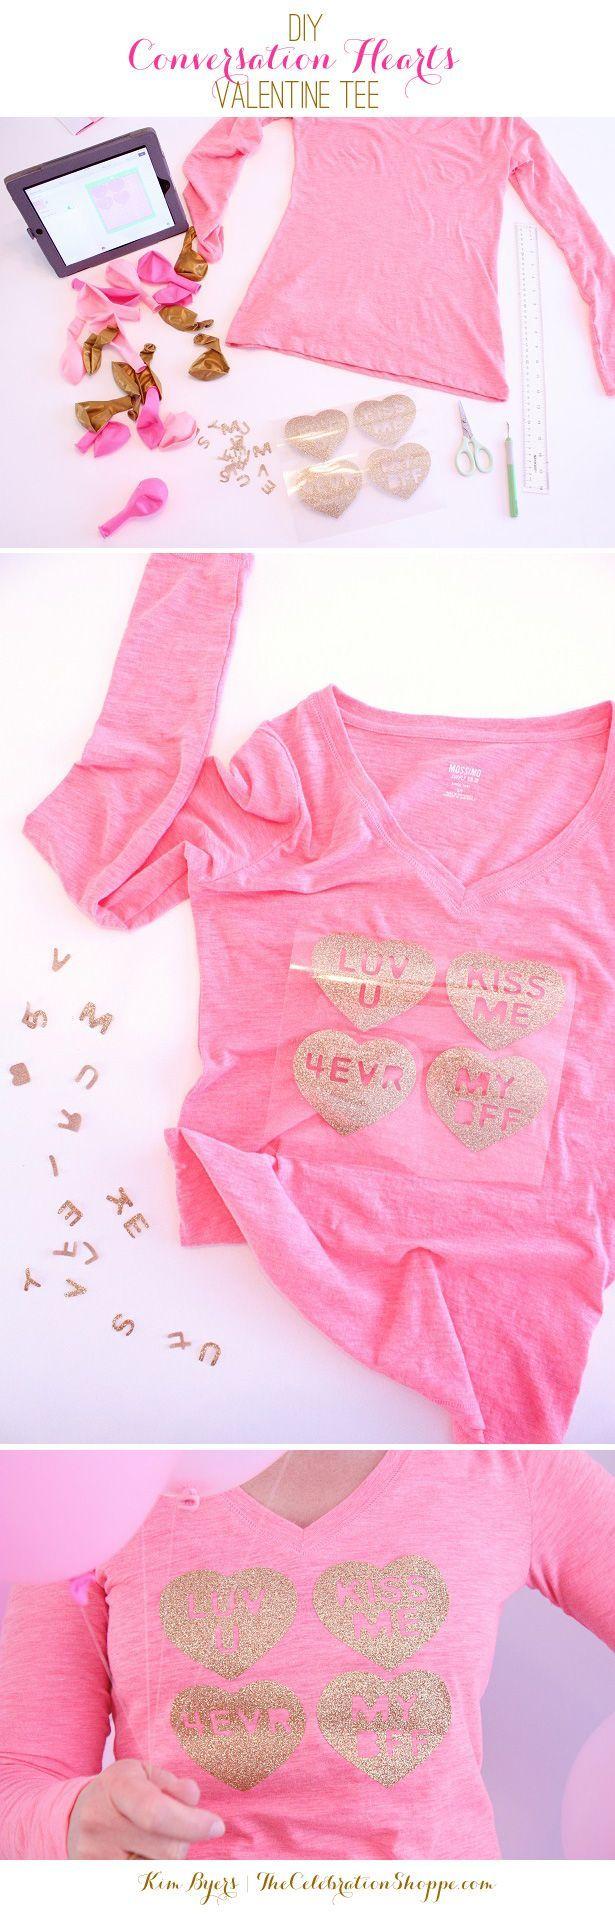 DIY Valentine Conversation Heart Tee - Step by Step How to: Valentine's Day T-Shirt Tutorial